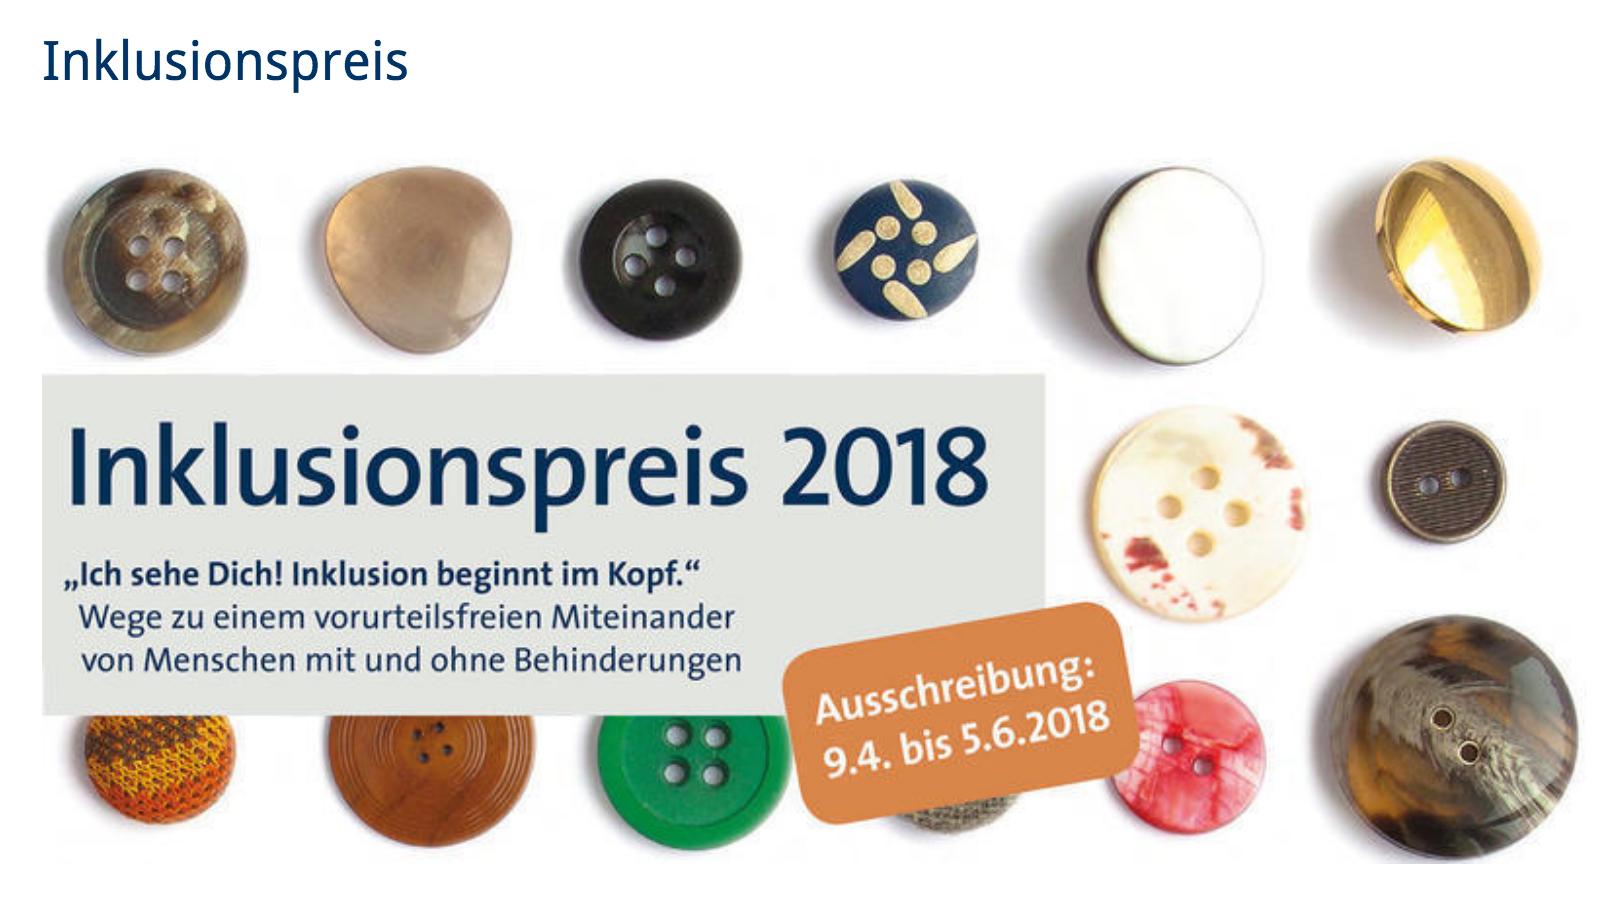 Inklusionspreis 2018 dees Bezirks Oberbayern